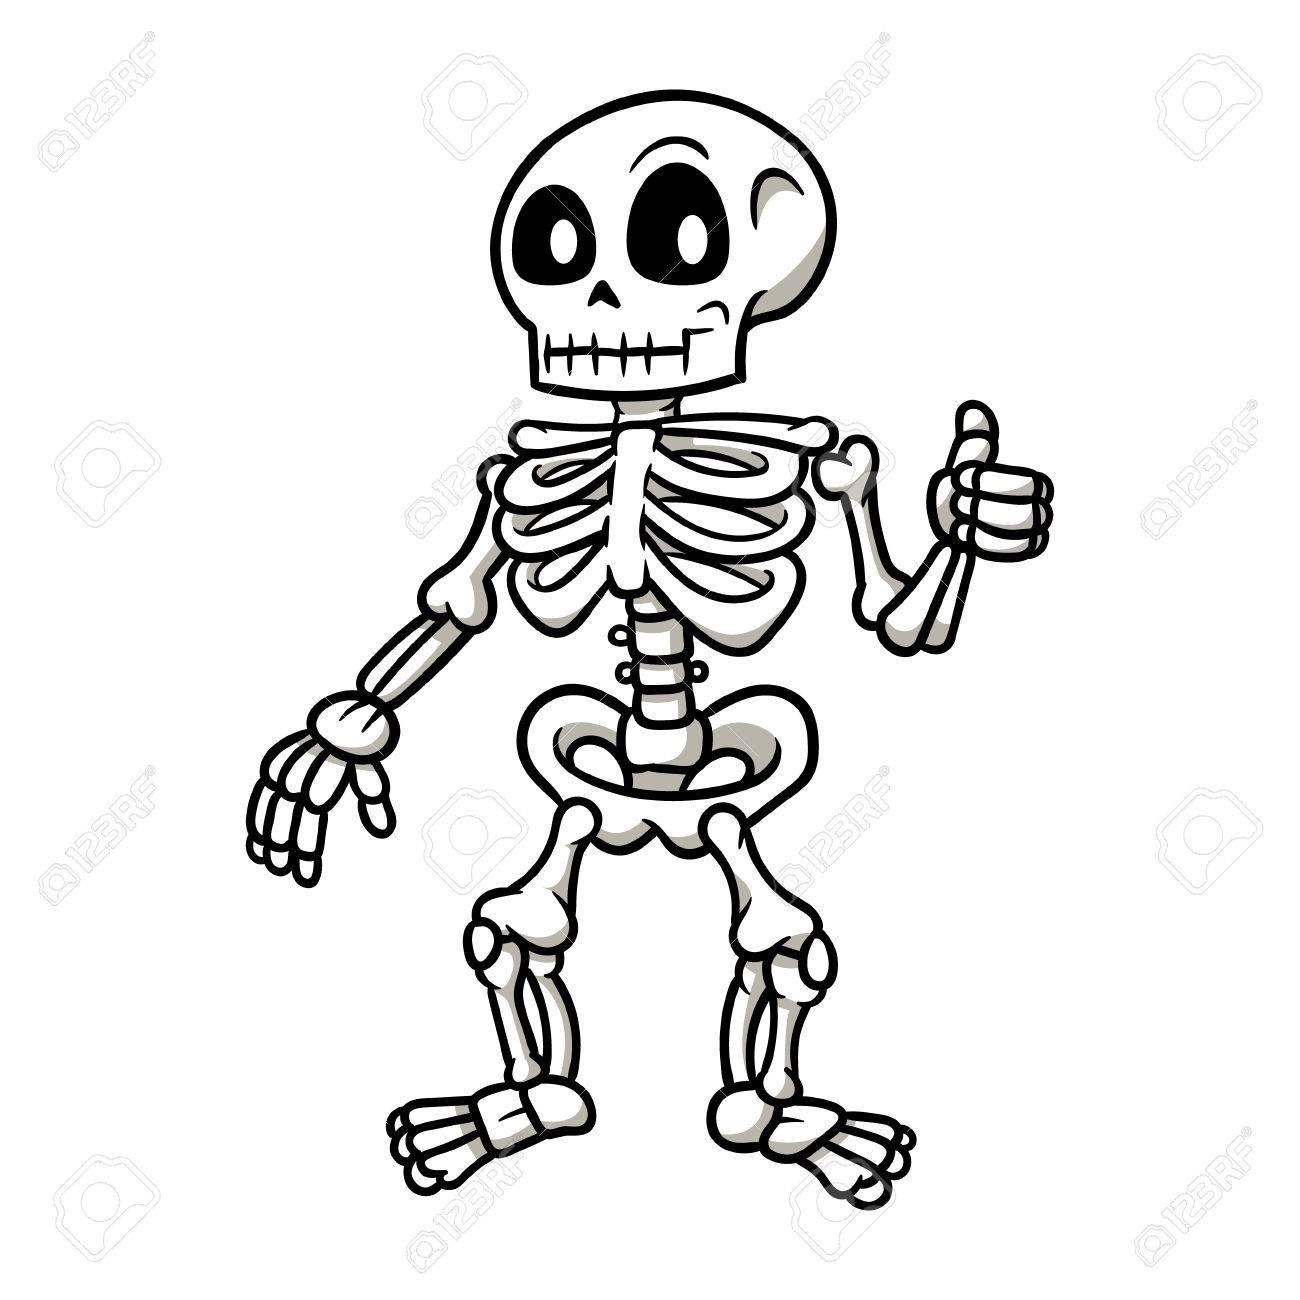 image black and white download Stock math in skeleton. Bones vector illustration